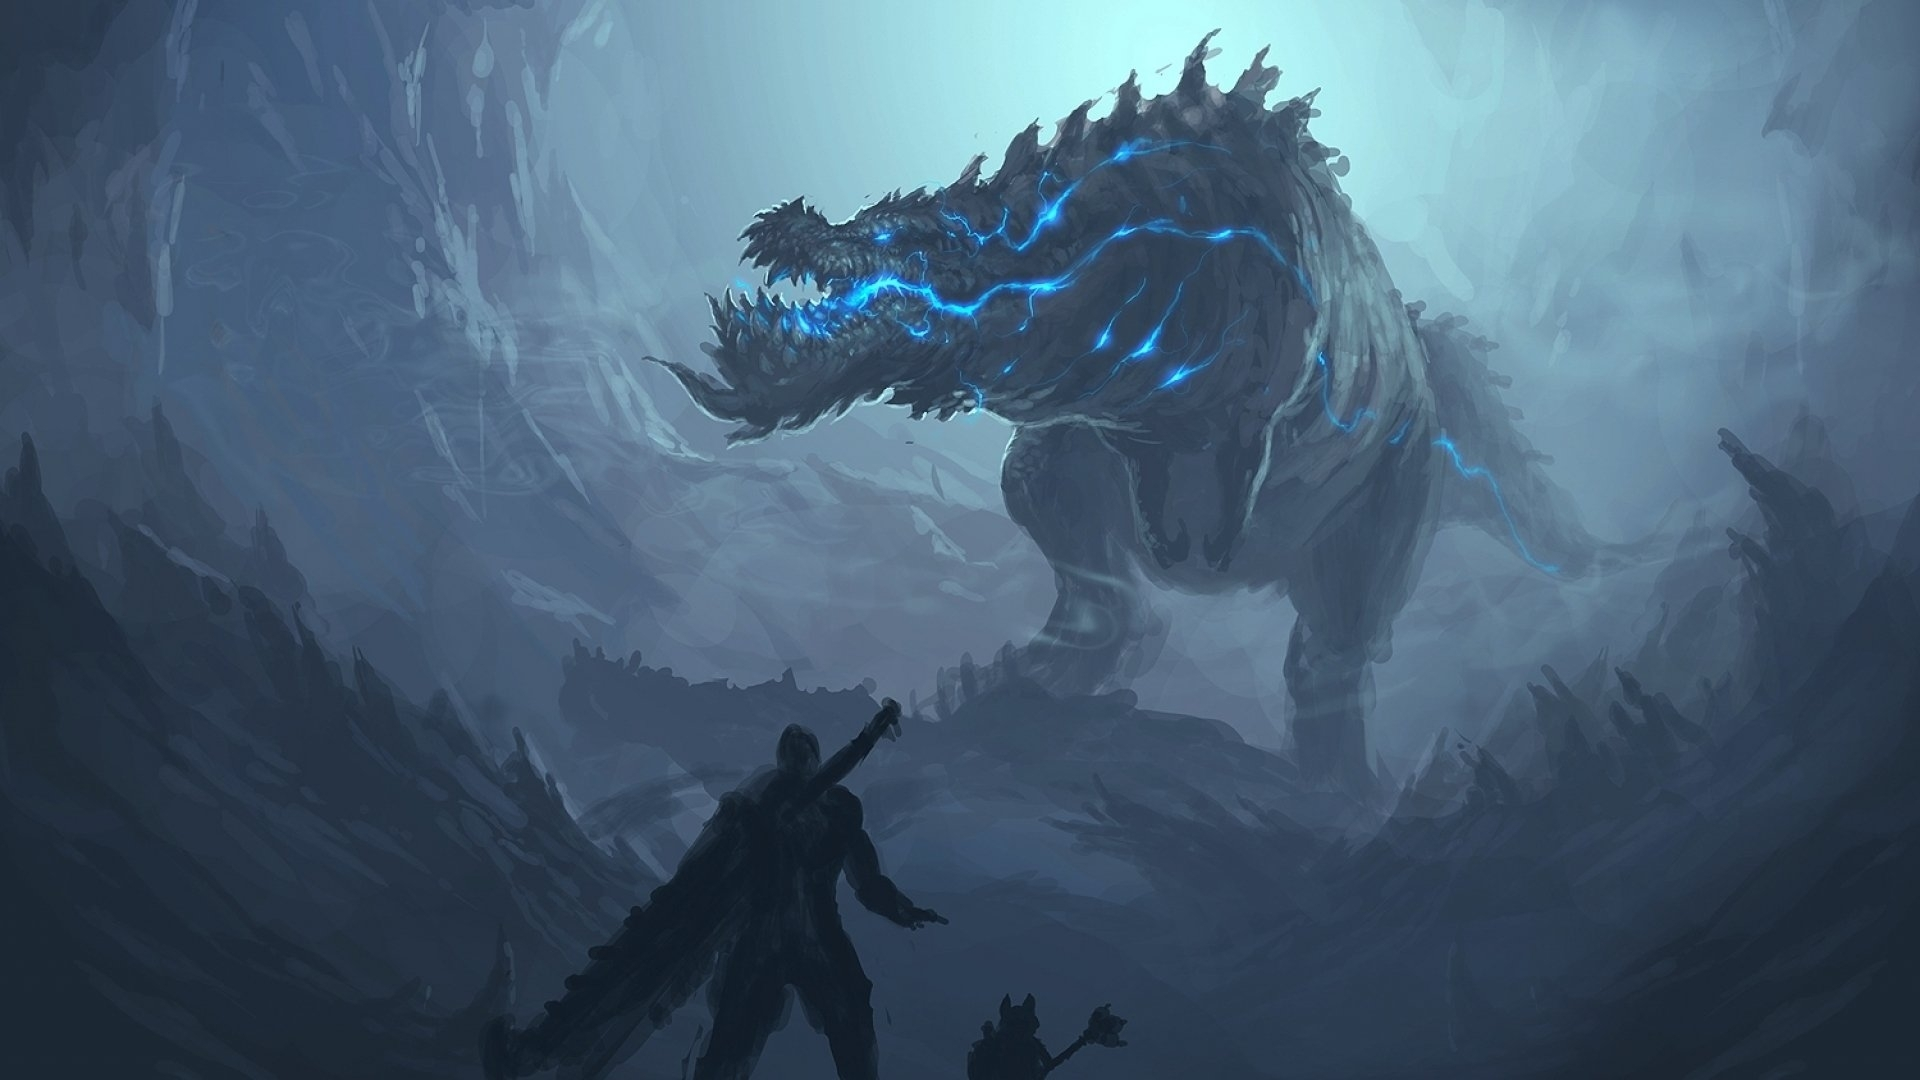 130 monster hunter fonds d'écran hd | arrière-plans - wallpaper abyss